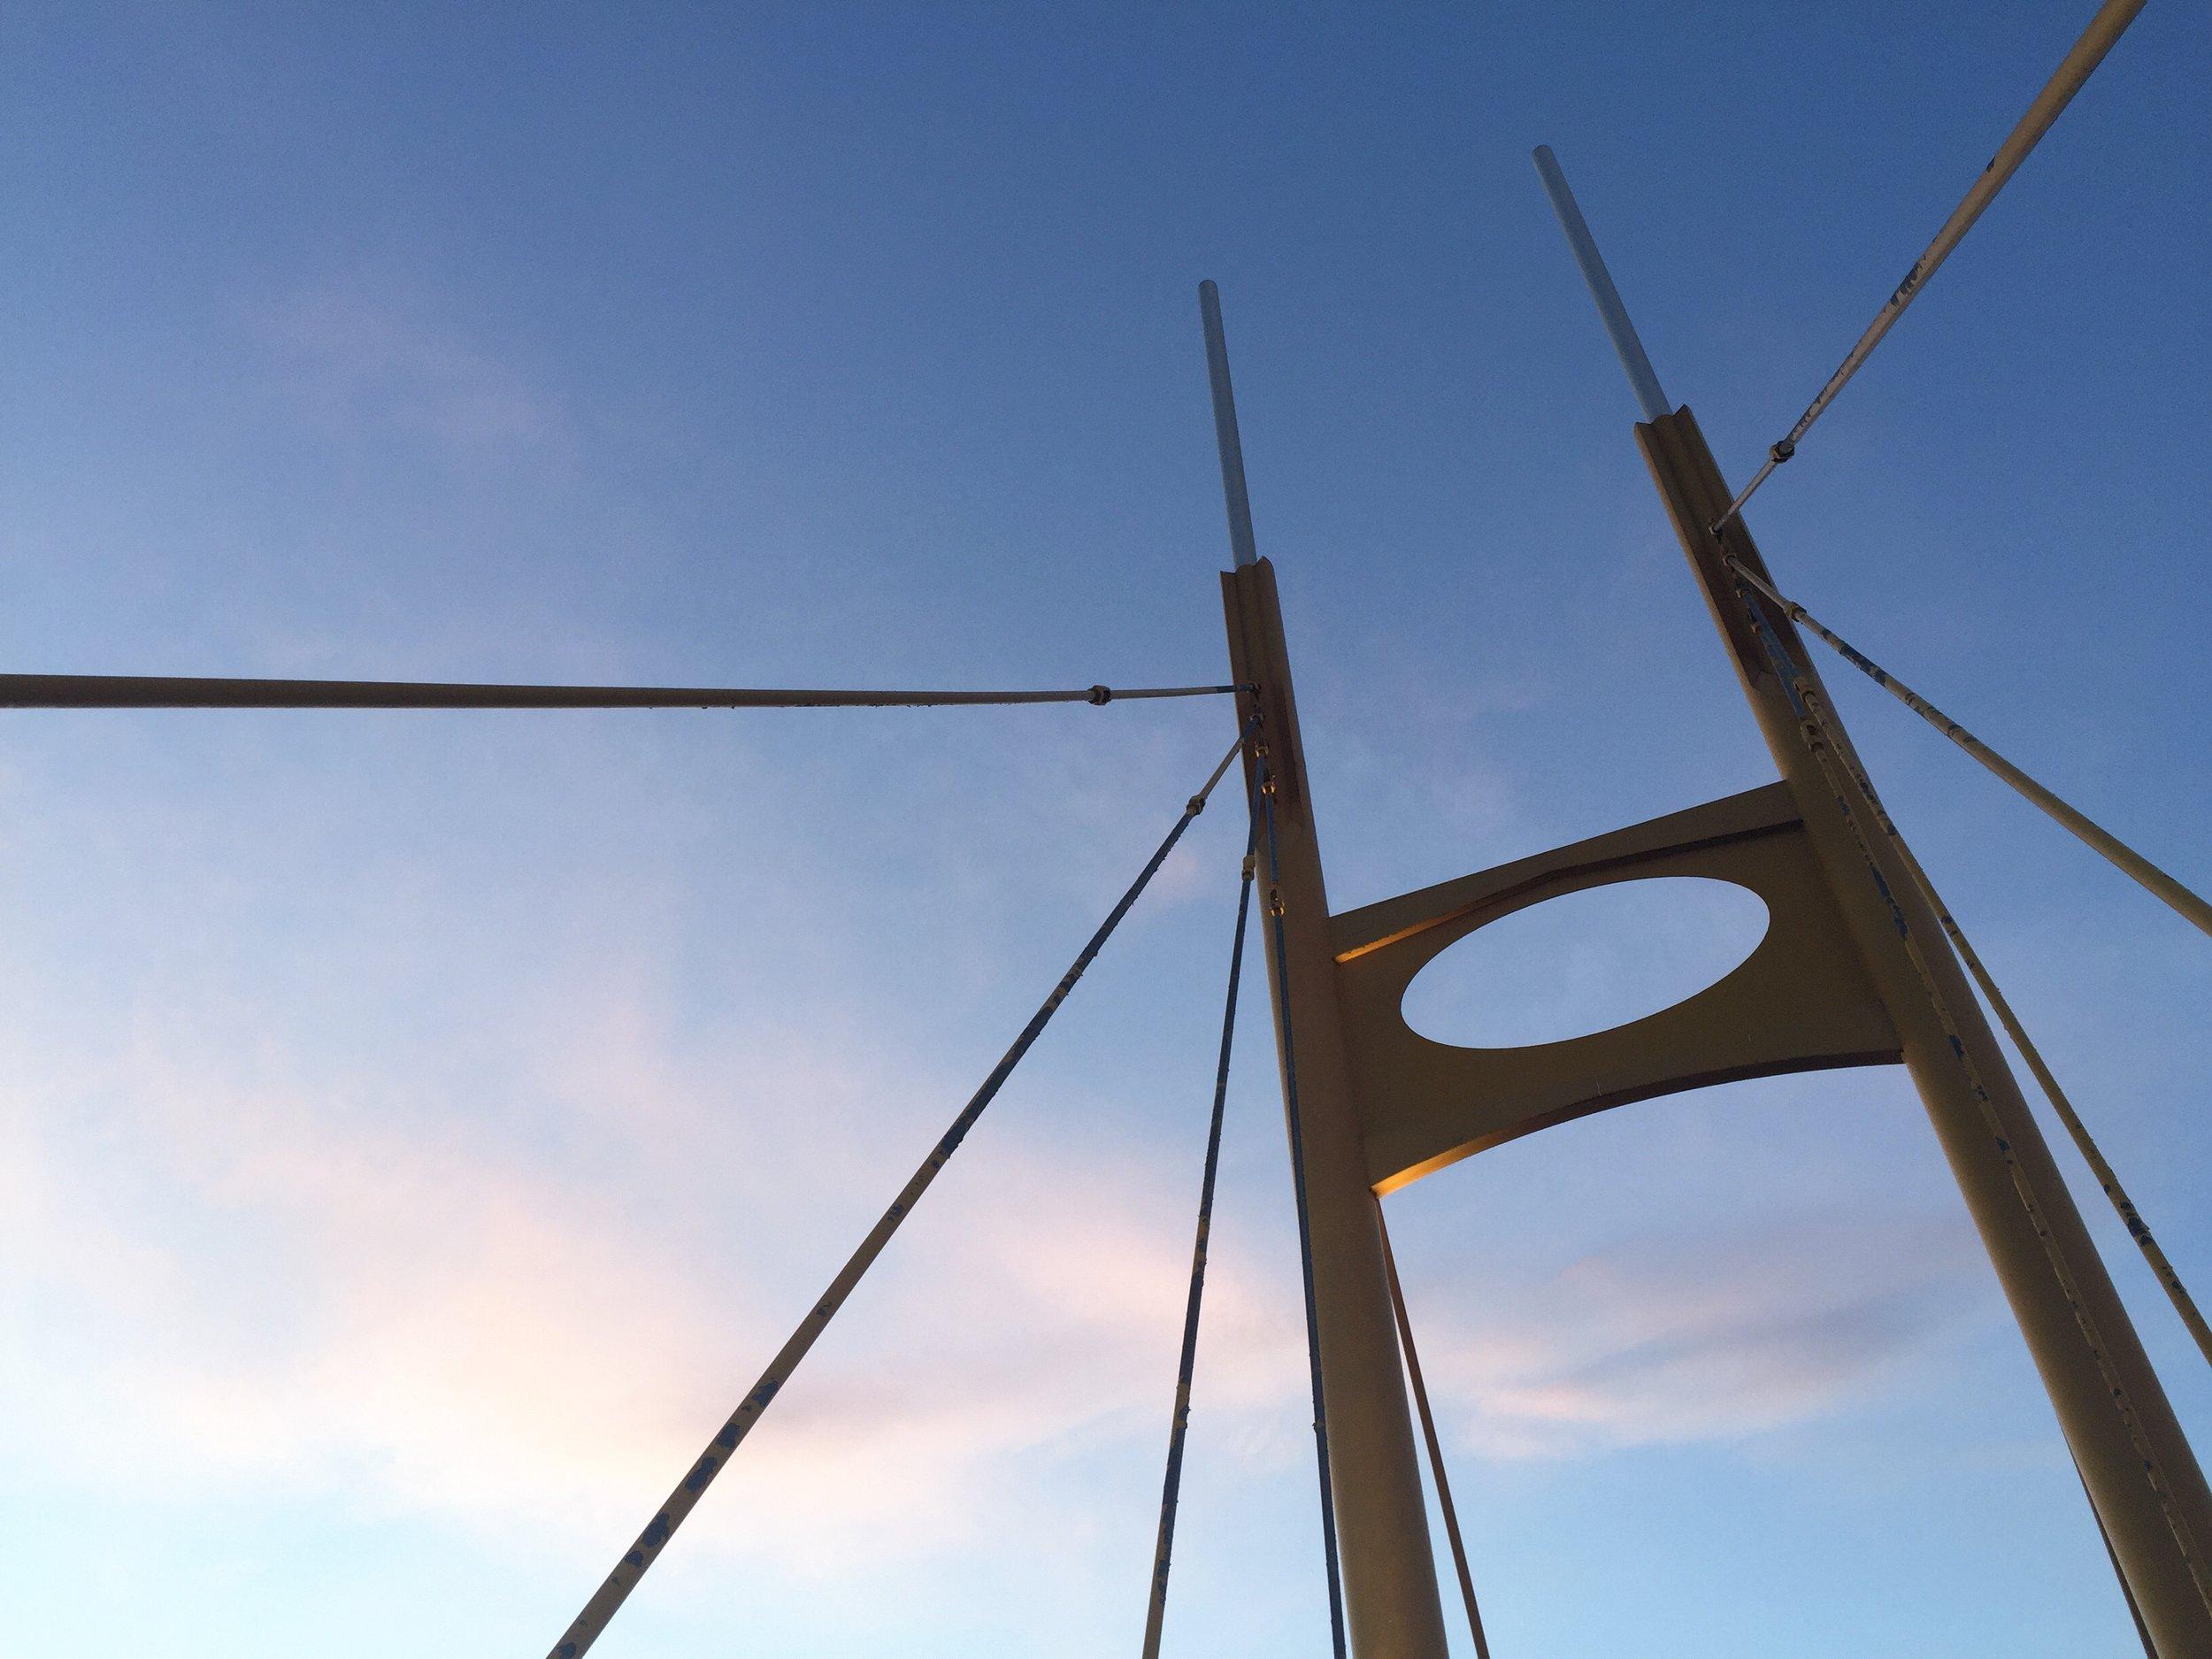 Kamloops Yellow Pedestrian Bridge